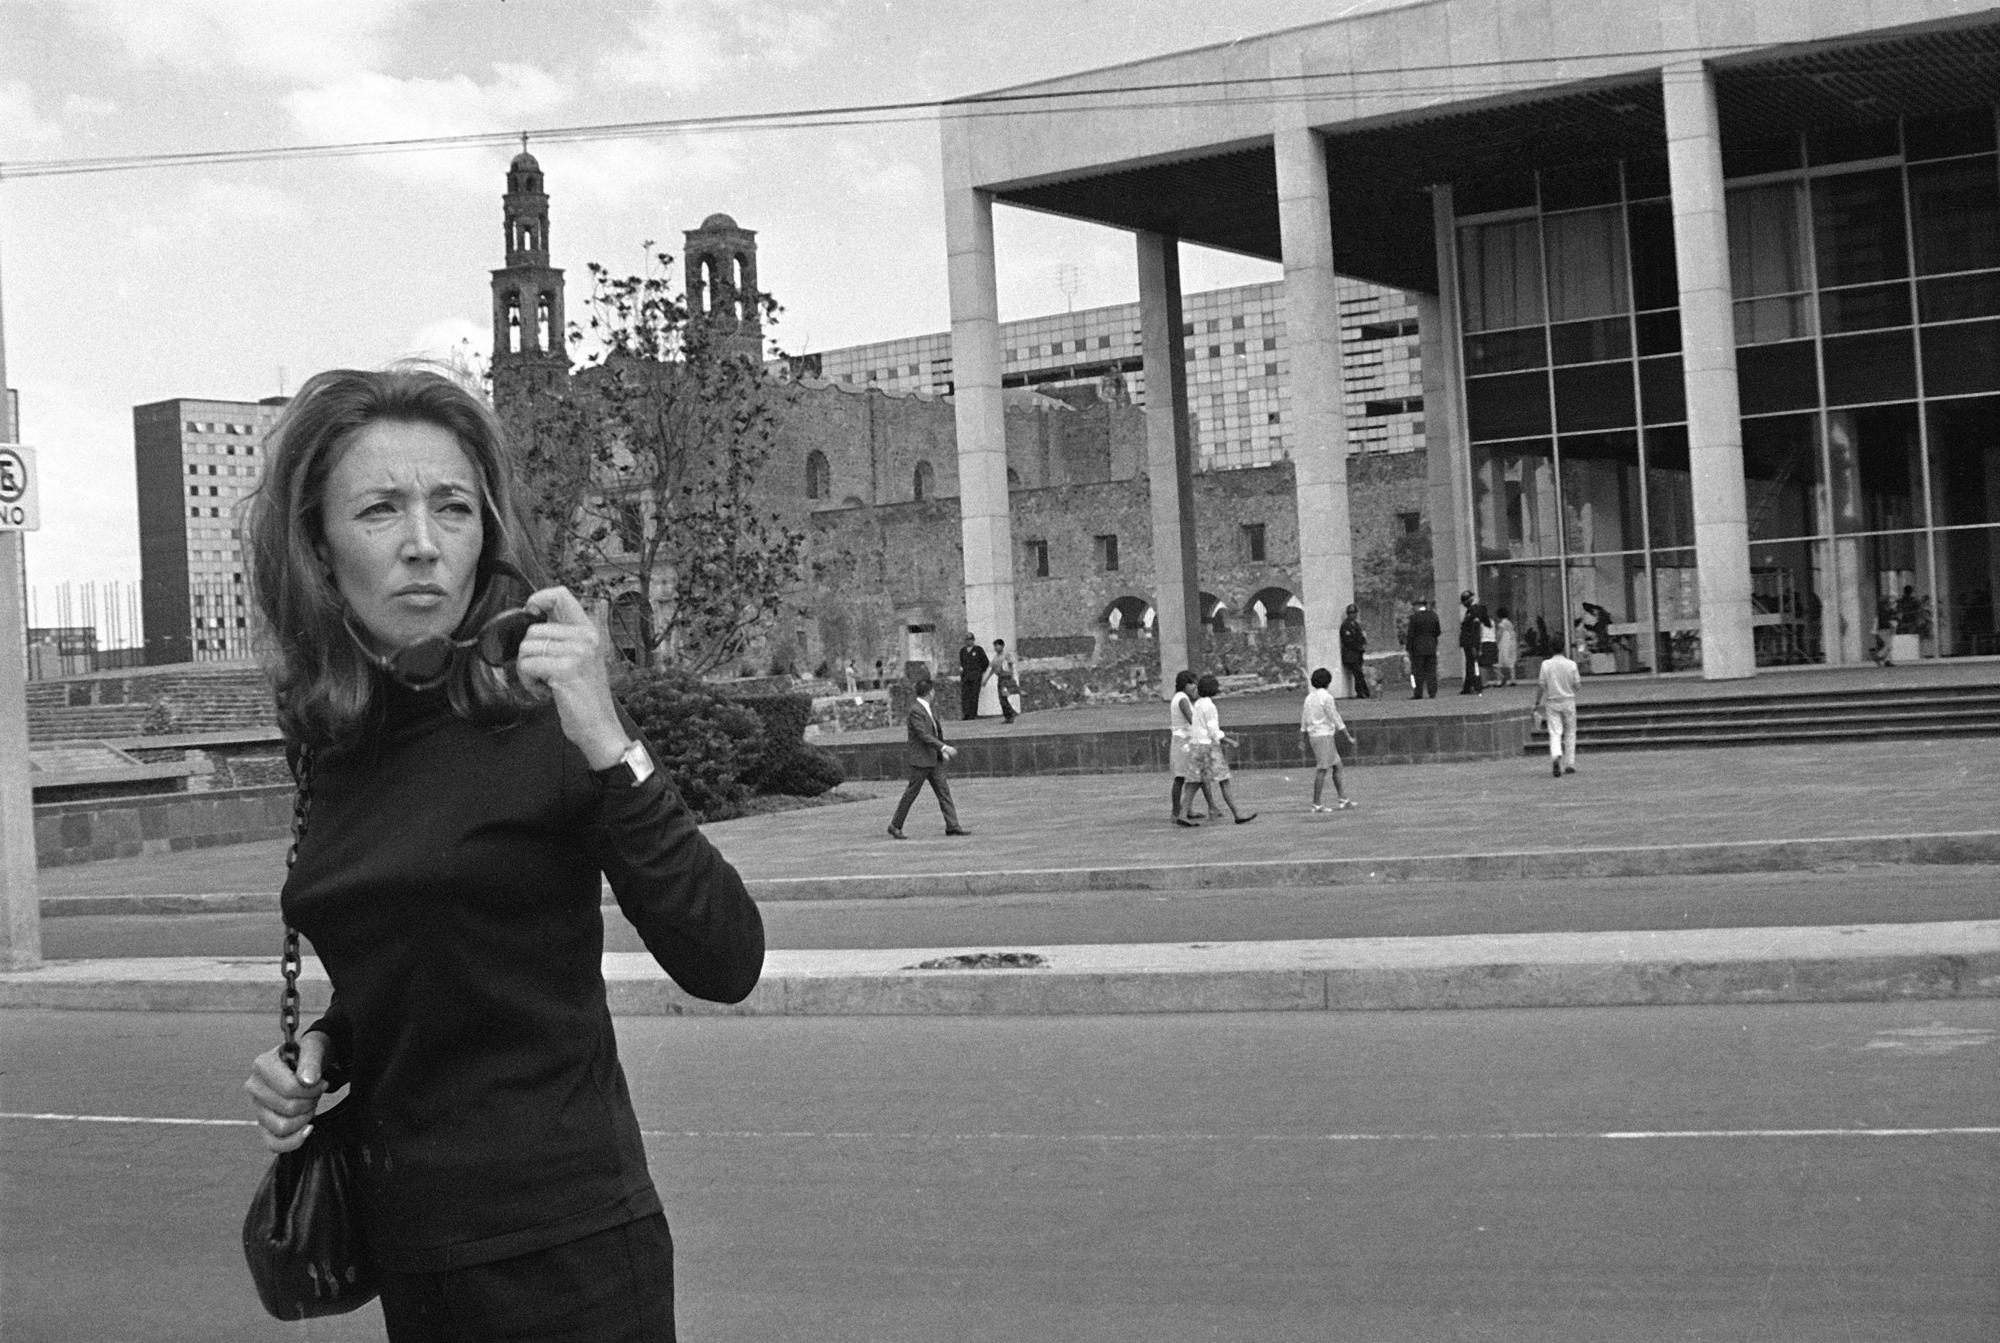 http://mononews.gr/wp-content/uploads/2016/02/Oriana-Fallaci-.jpg